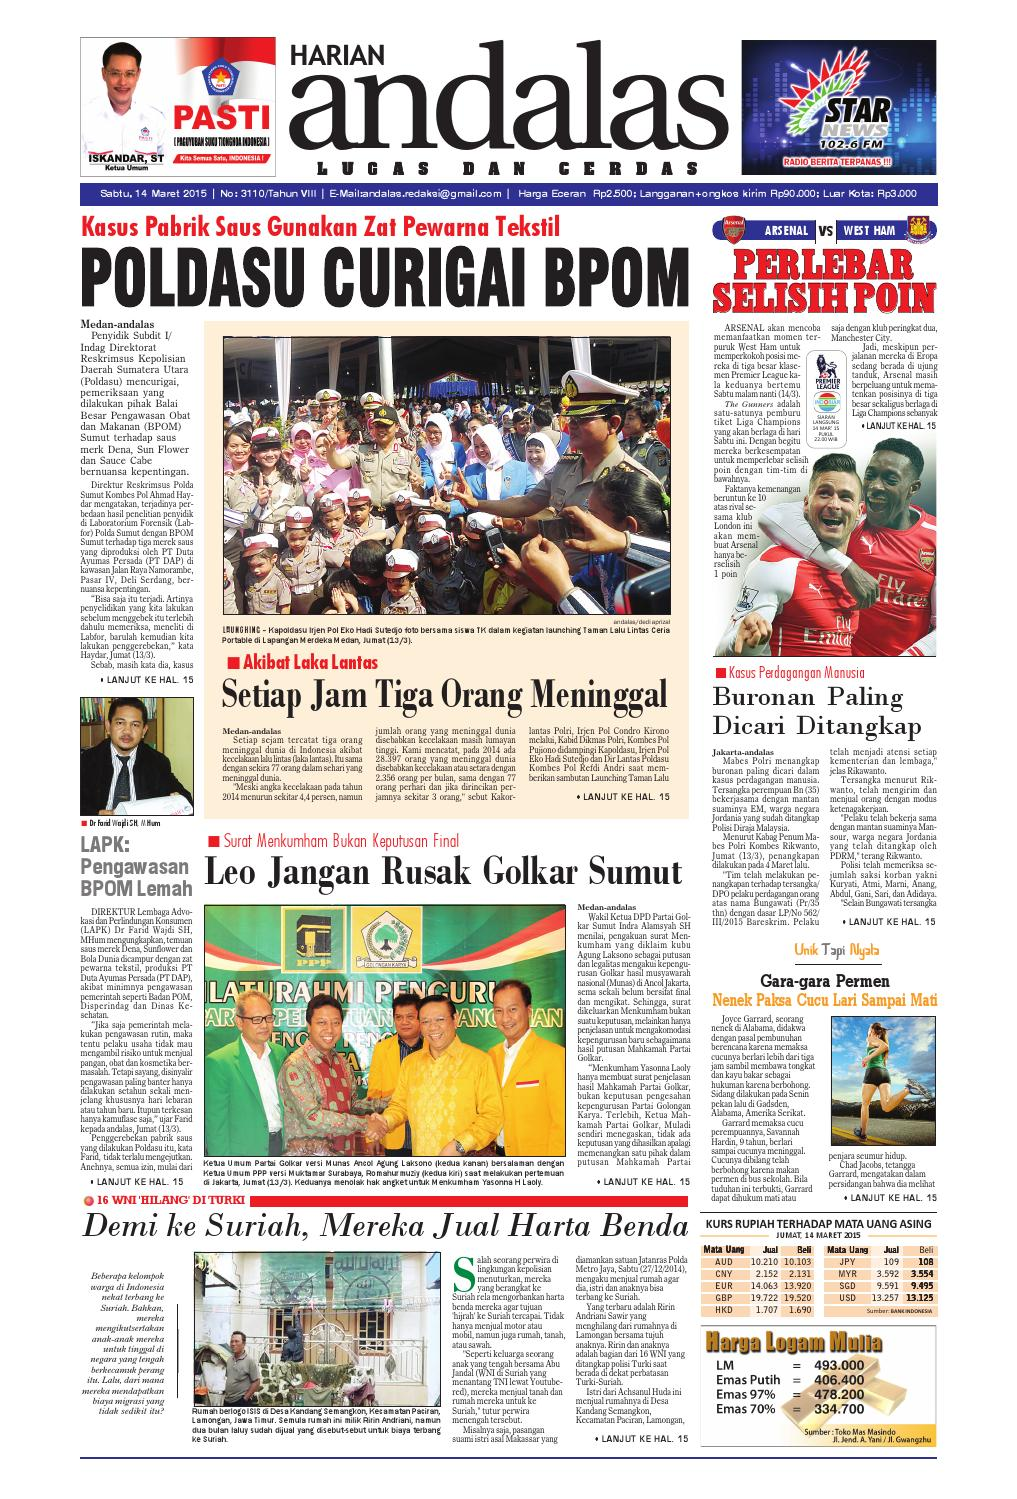 Epaper andalas edisi sabtu 14 maret 2015 by media andalas - issuu fa6a938f9c